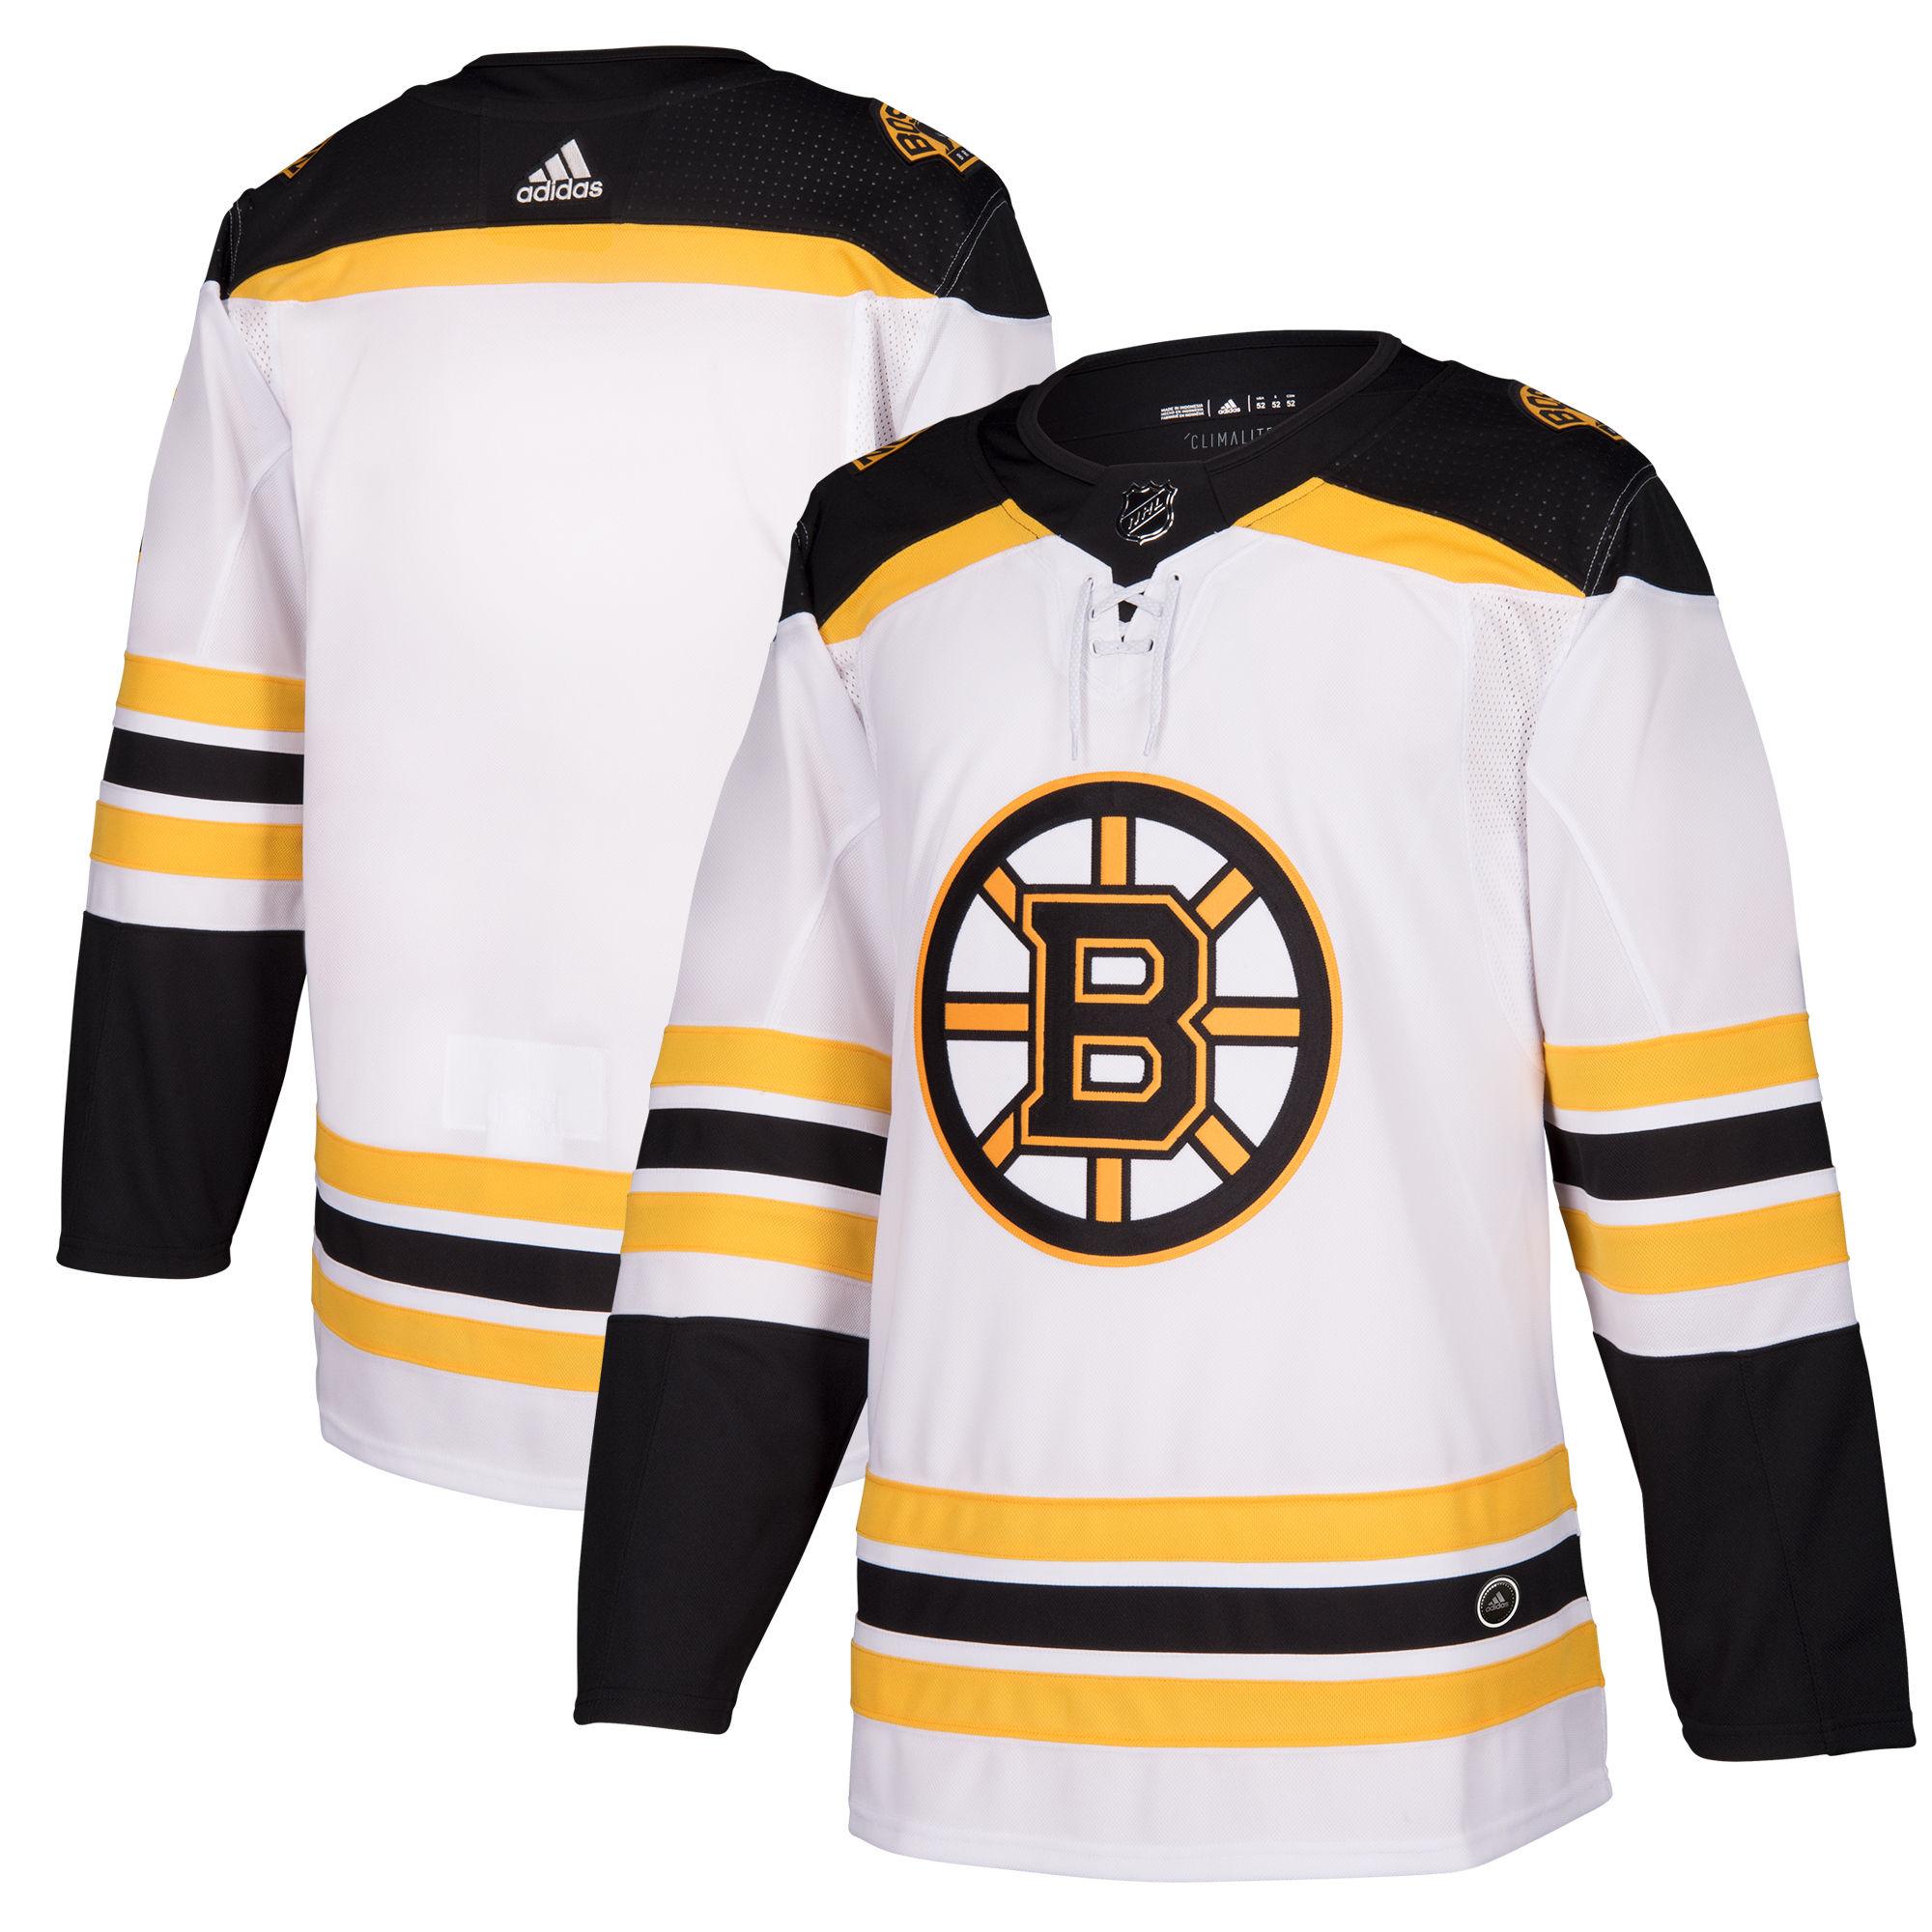 Adidas Dres Boston Bruins adizero Away Authentic Pro Velikost: 52 (L)